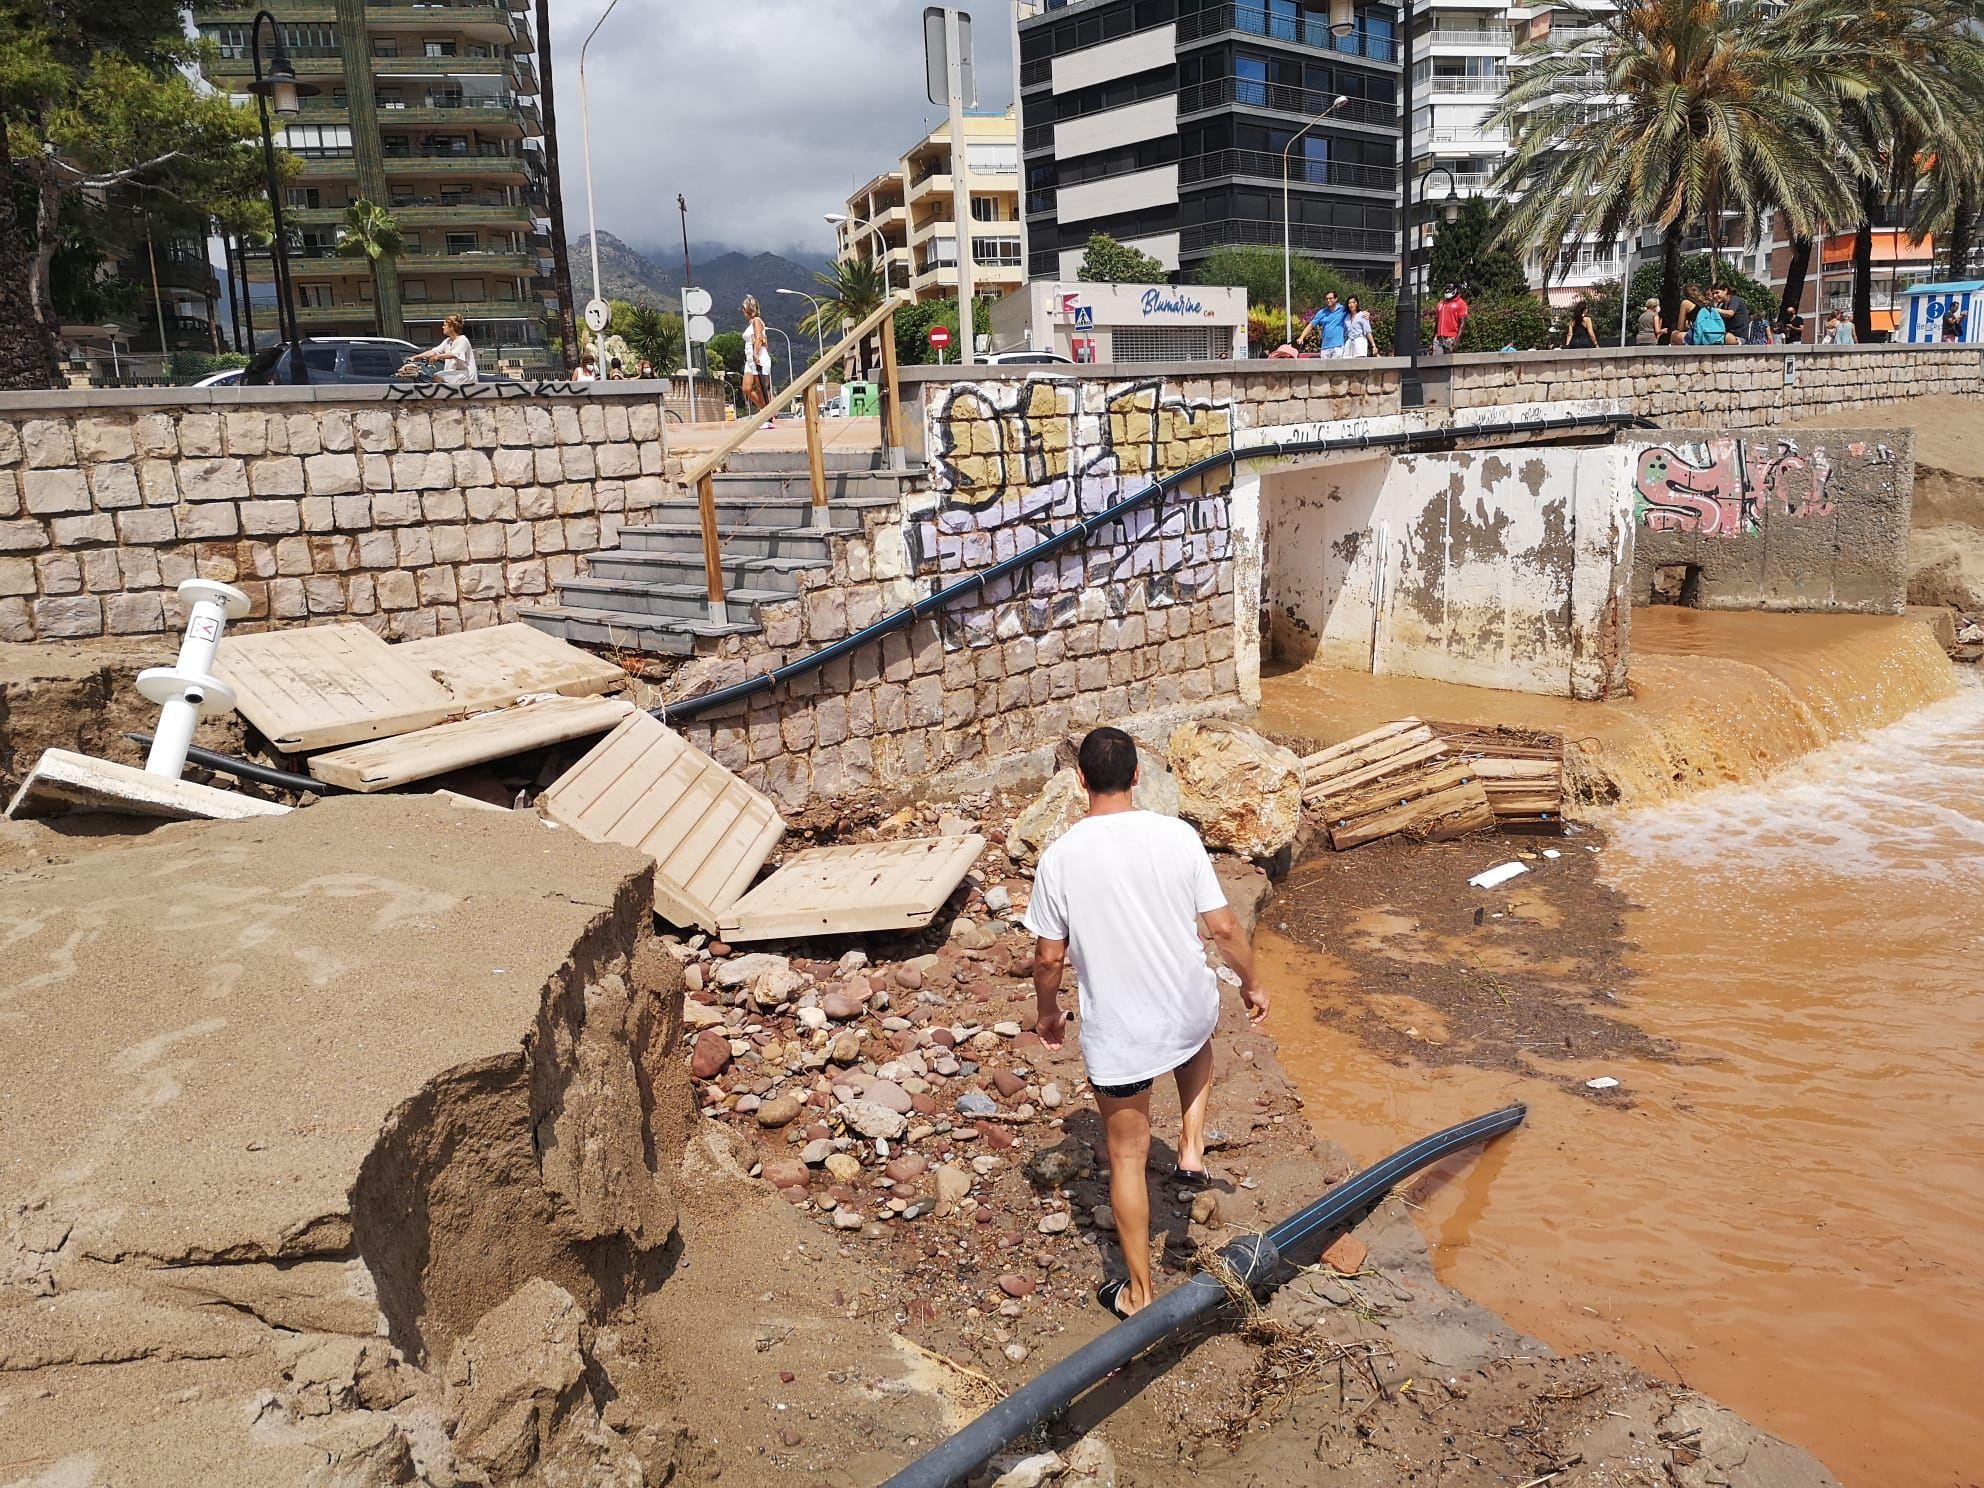 Impactantes imágenes del aguacero caído en Benicàssim